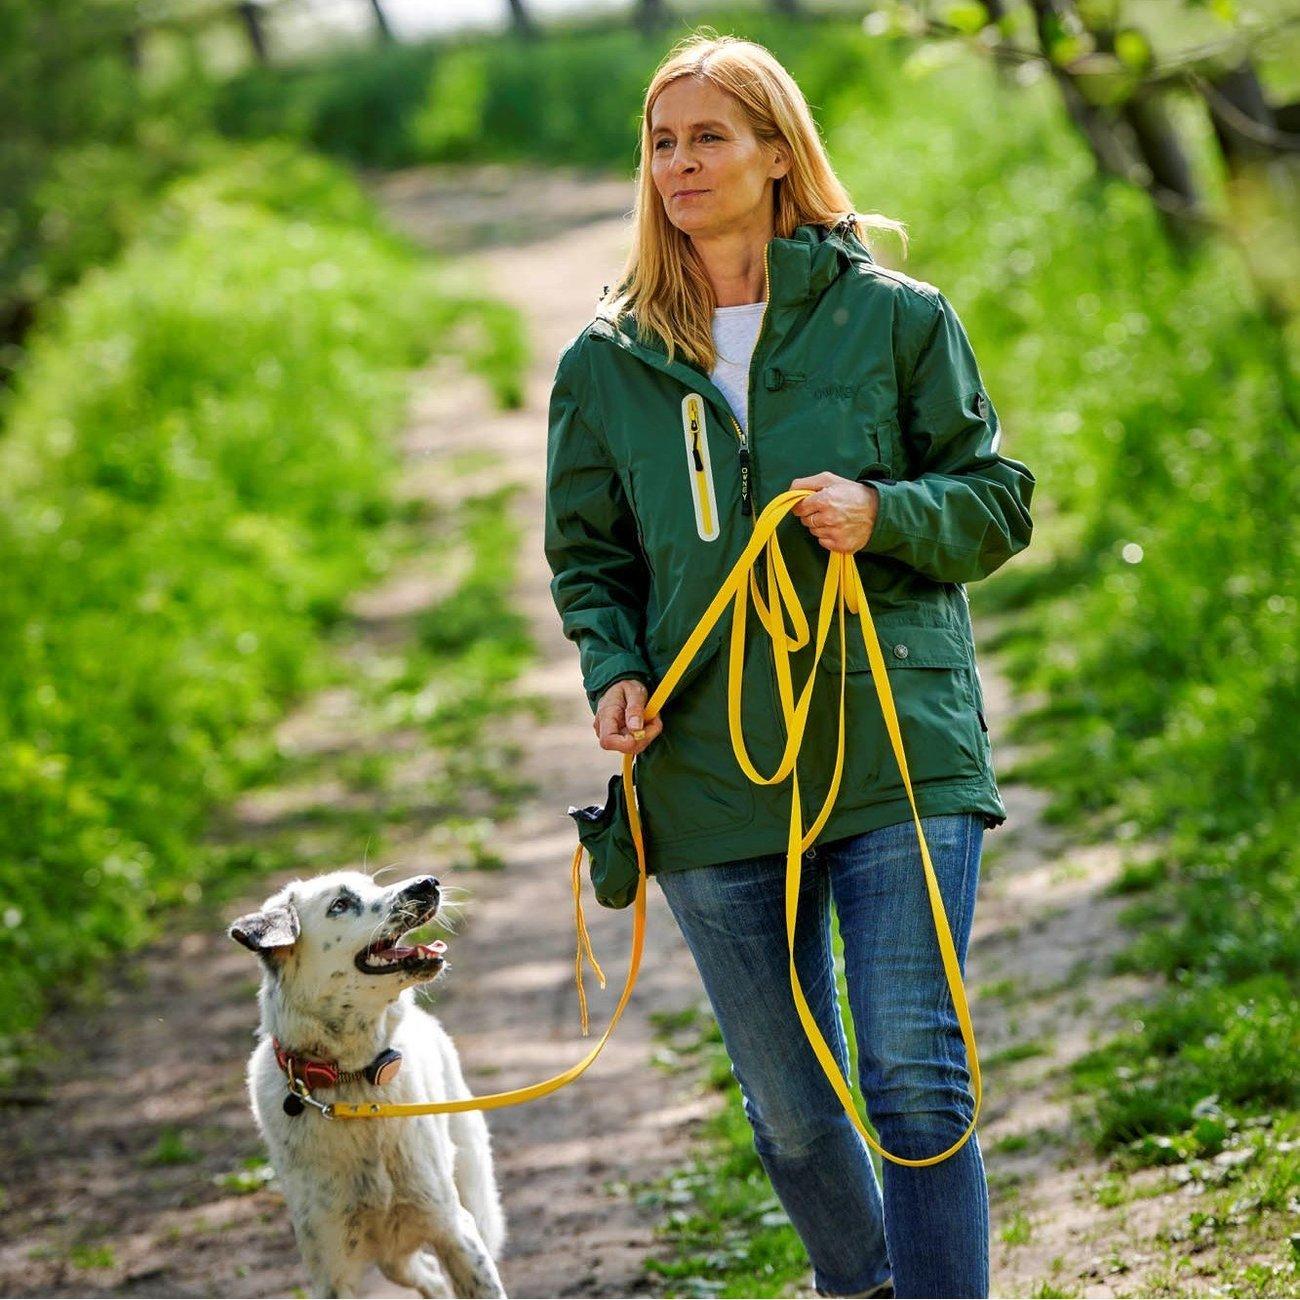 Hundesport Unisex Jacke Trusty Friend Bild 2